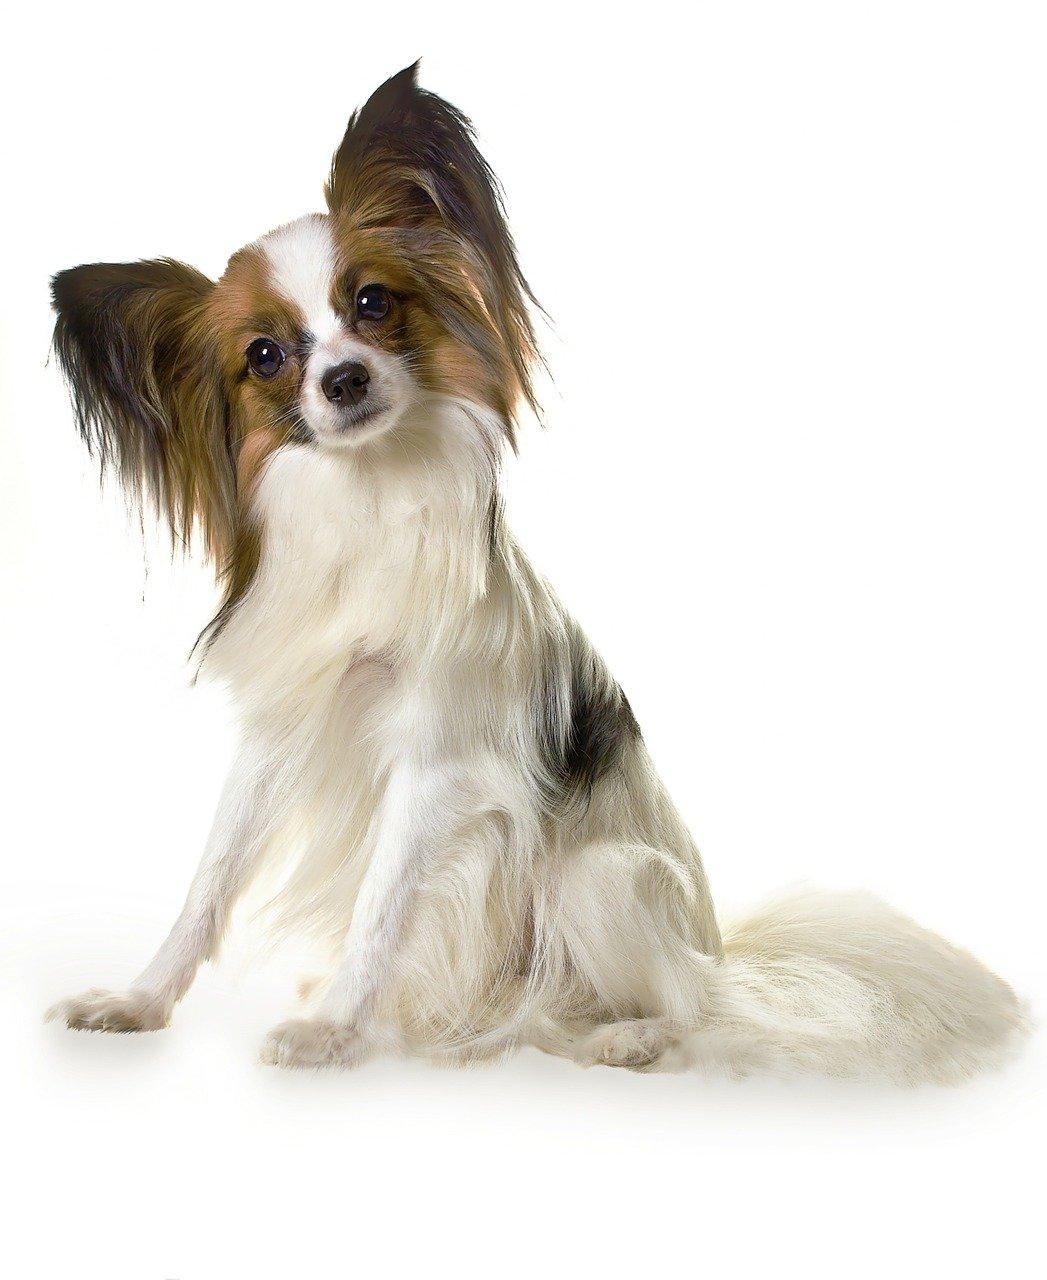 papillon, dog, animal-274181.jpg